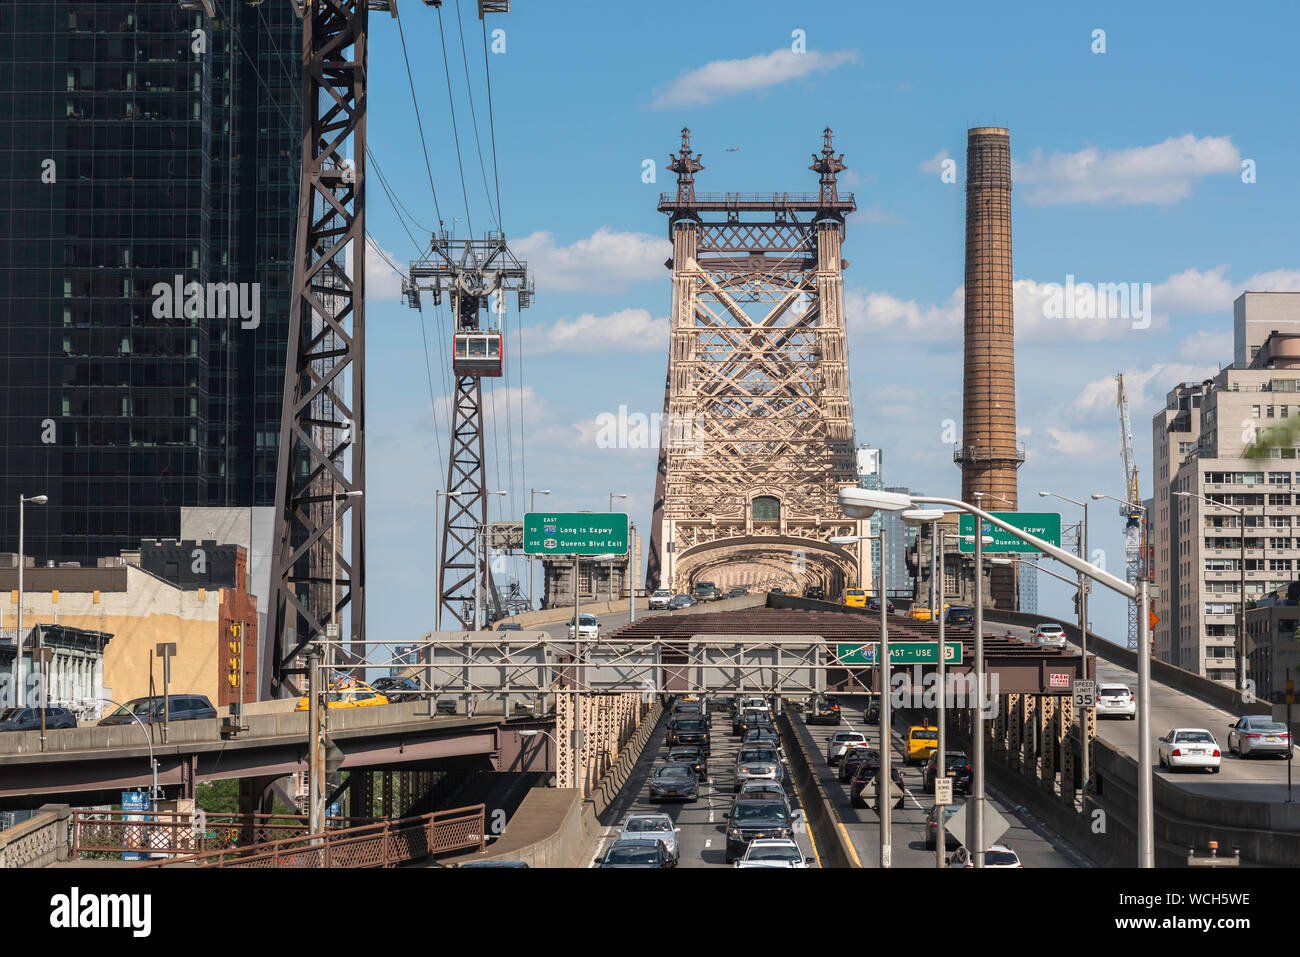 Queensboro Bridge, view in summer of traffic on the Manhattan side of the Ed Koch Queensboro Bridge, New York City, USA Stock Photo